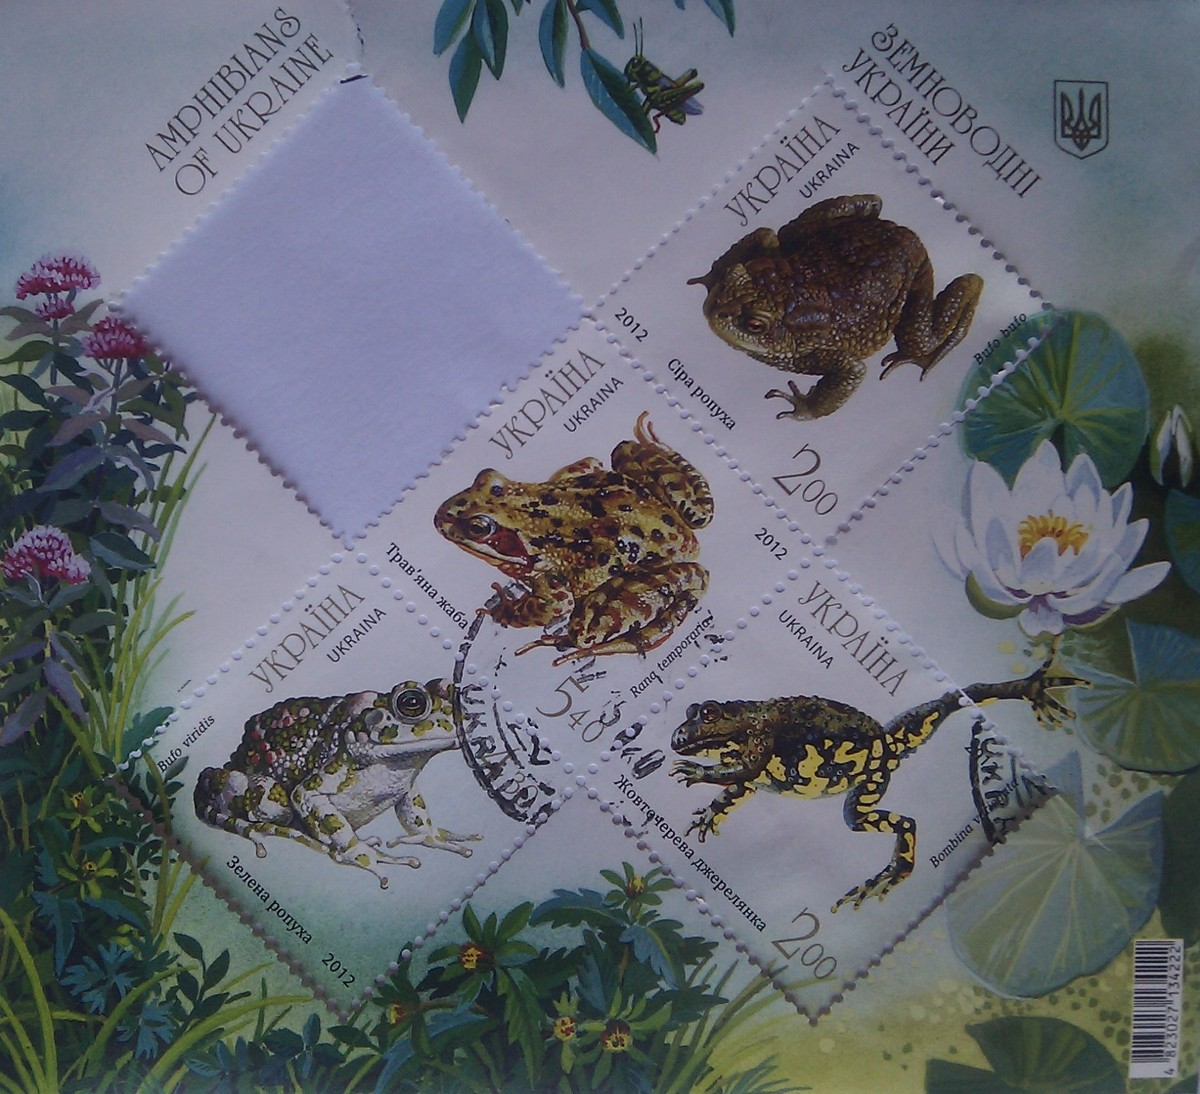 2012 N1262-1266 (b107) блок Земноводные Лягушки Фауна 4штуки